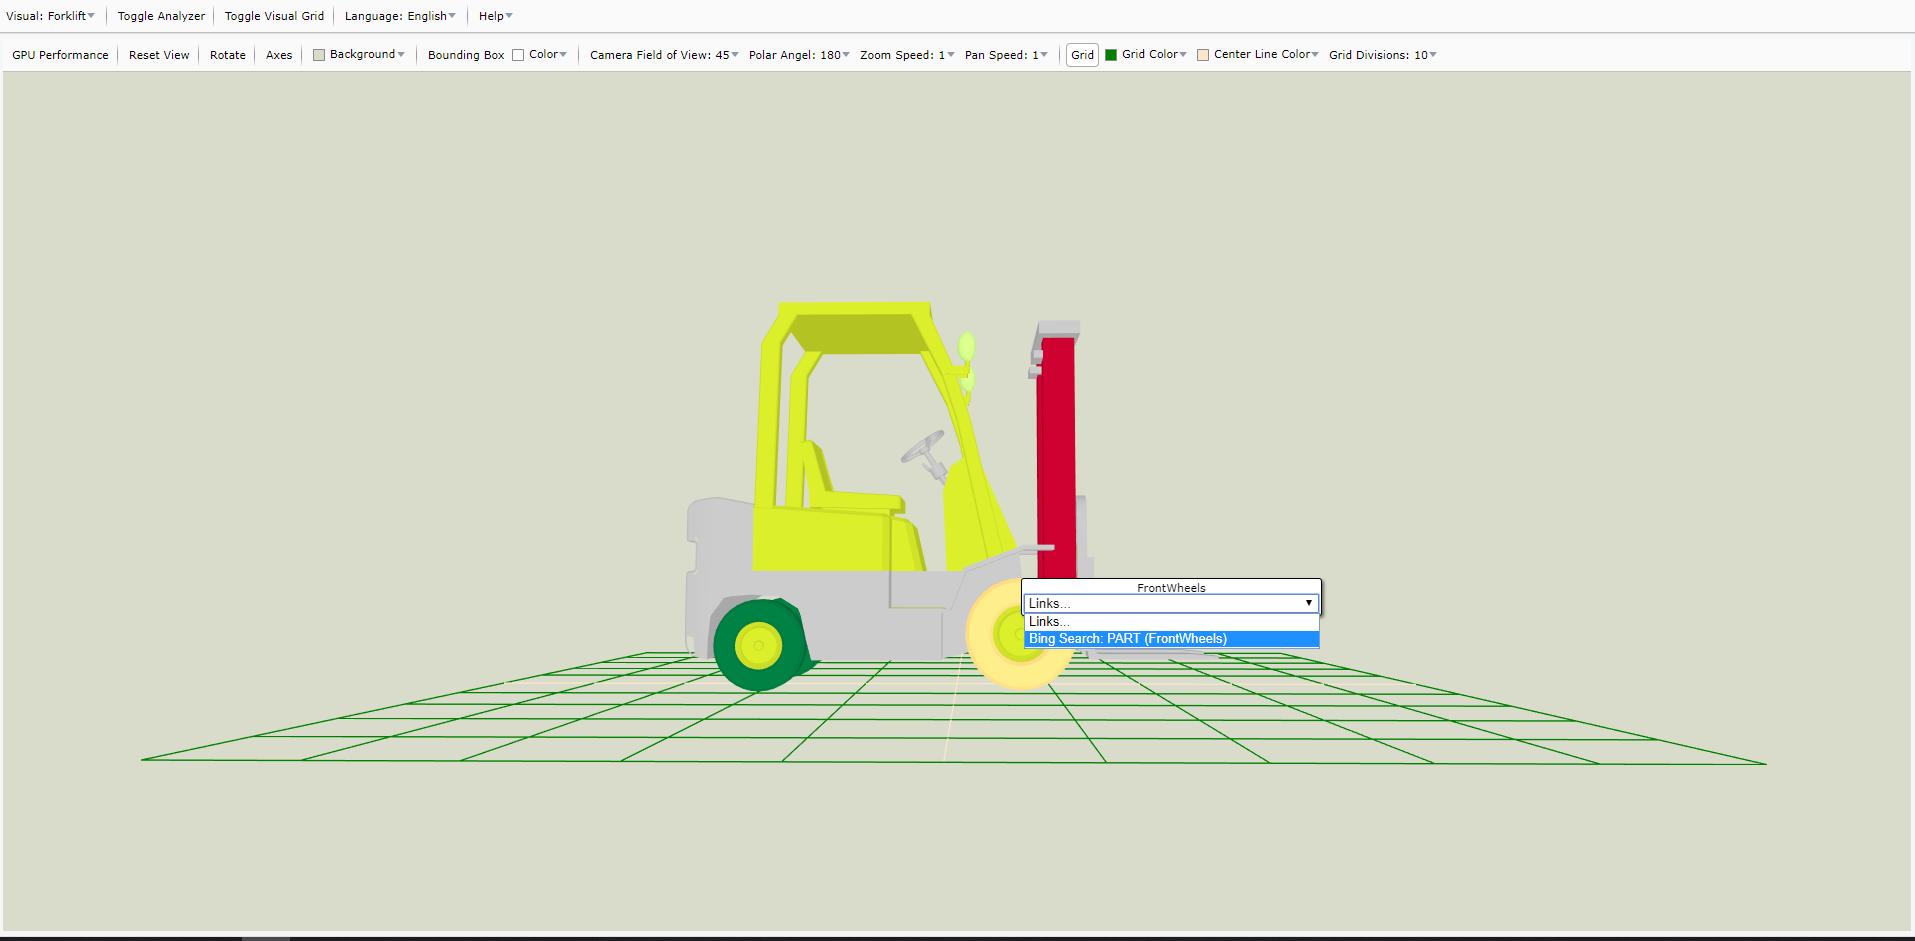 Screen Shot of My Data Visualizer ForkLift1